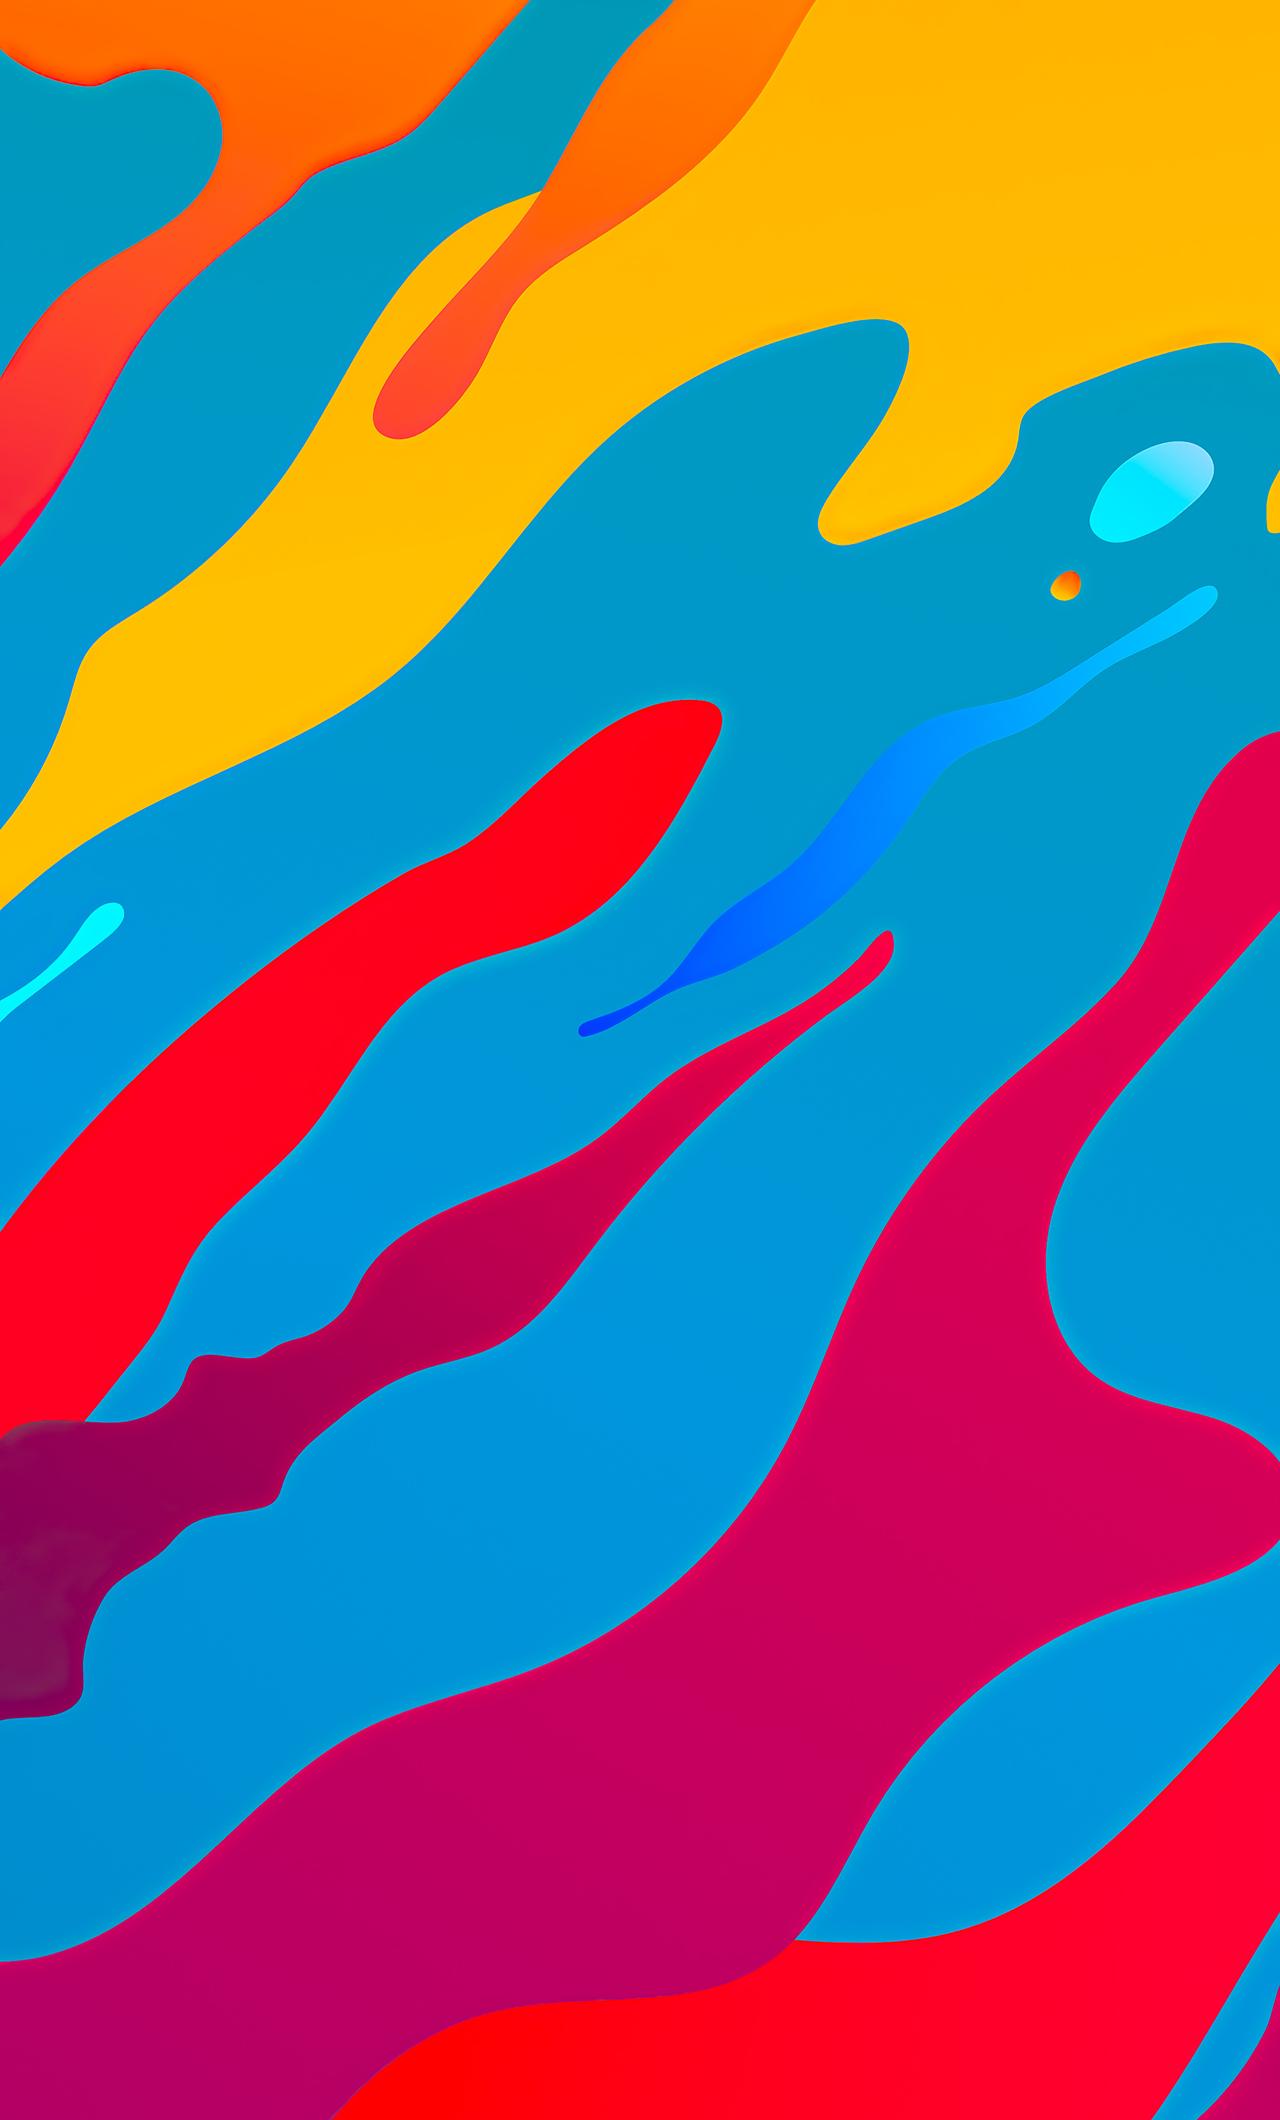 colors-splash-abstract-8k-o6.jpg